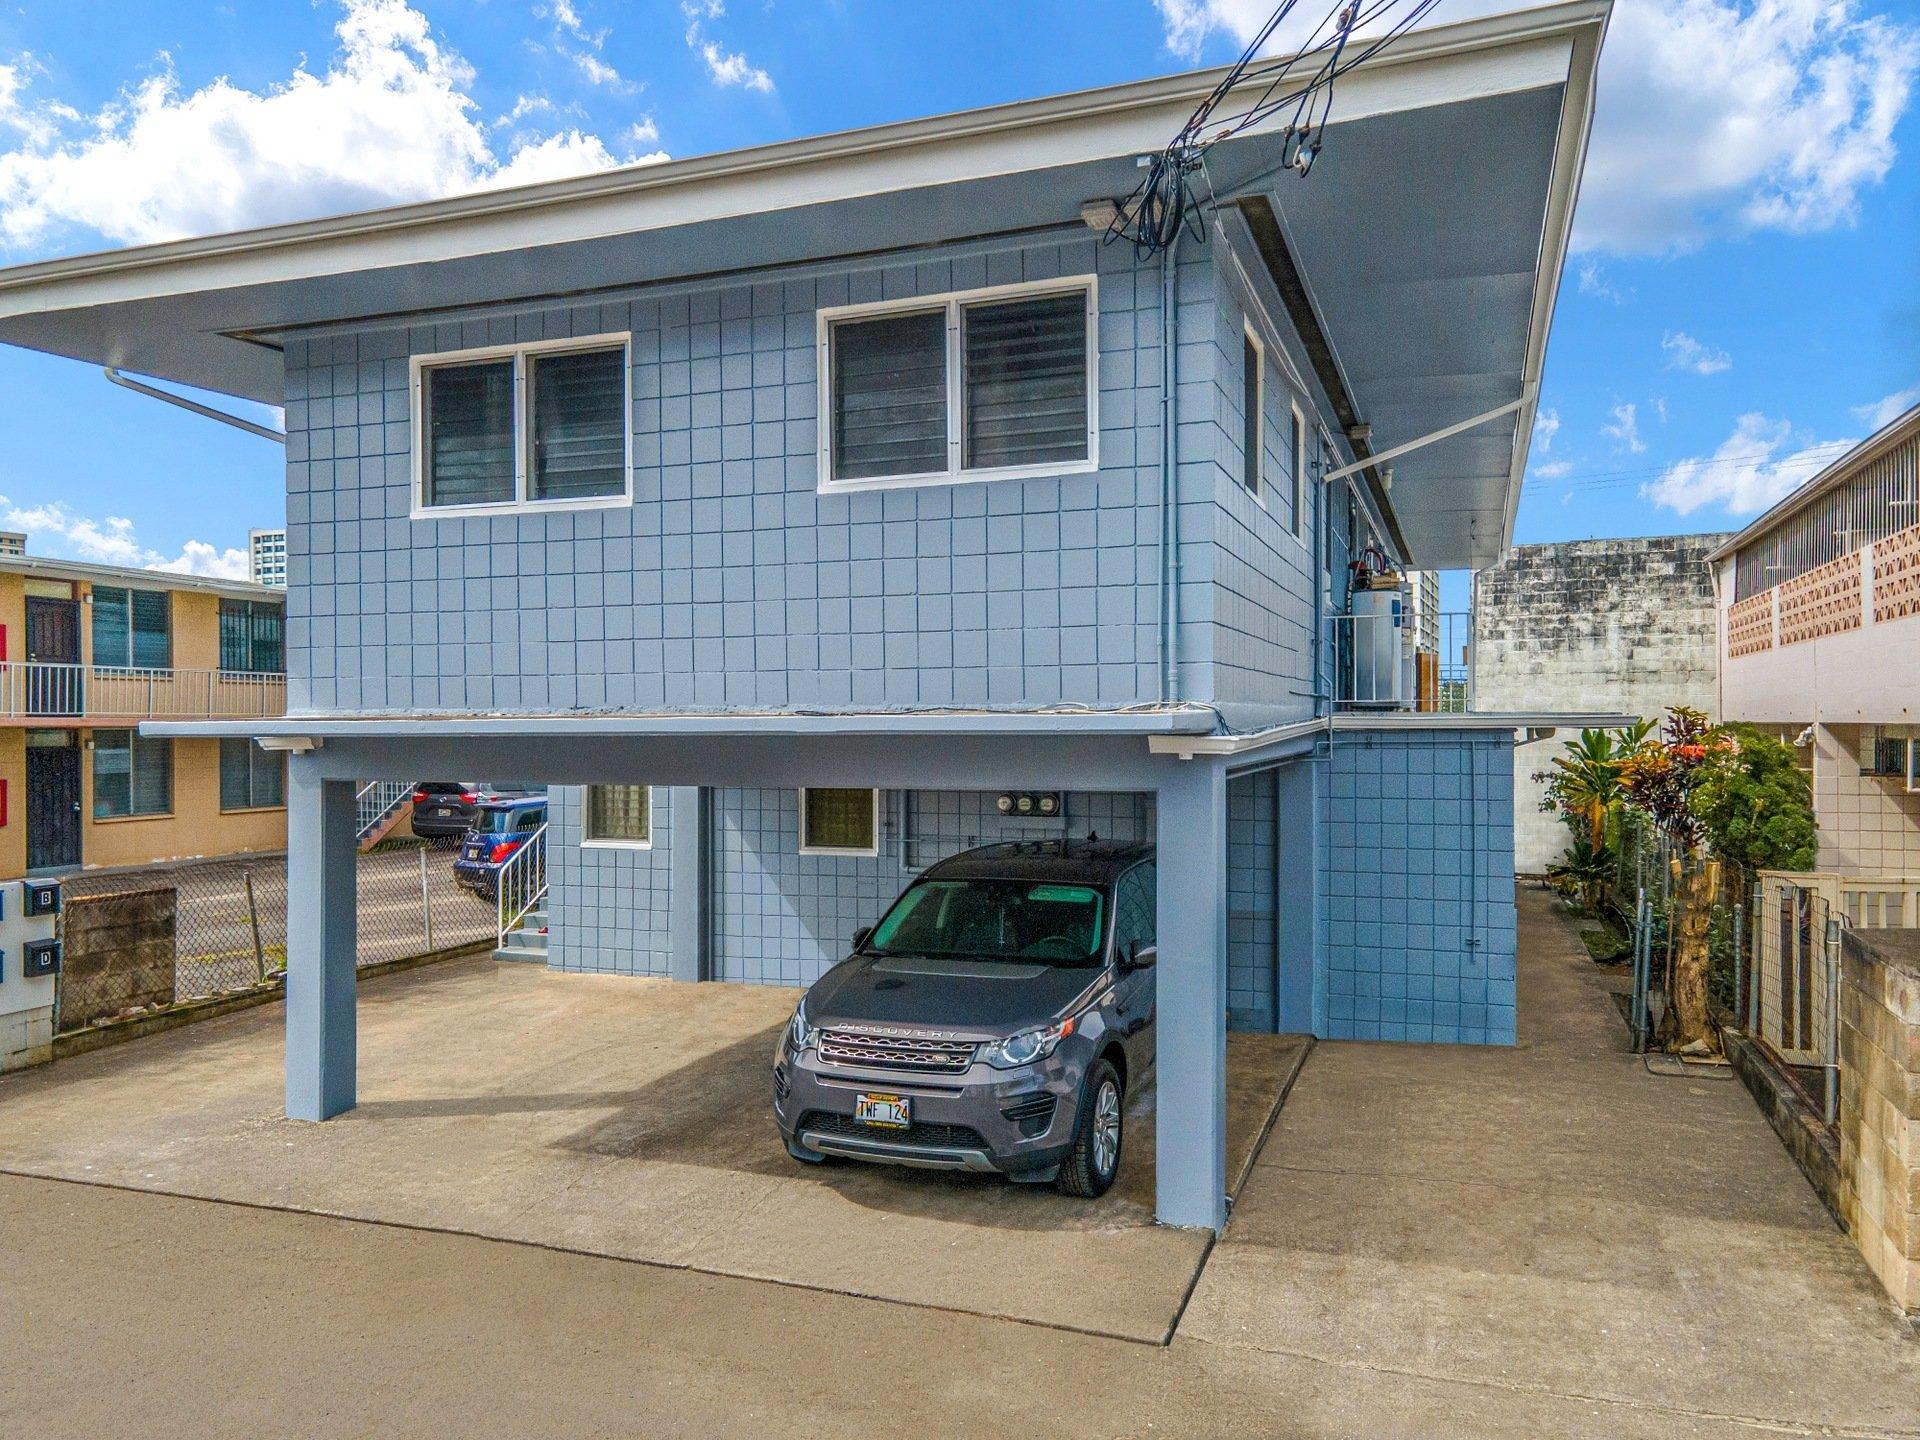 Apartment in Honolulu, Hawaii, United States 1 - 11636382